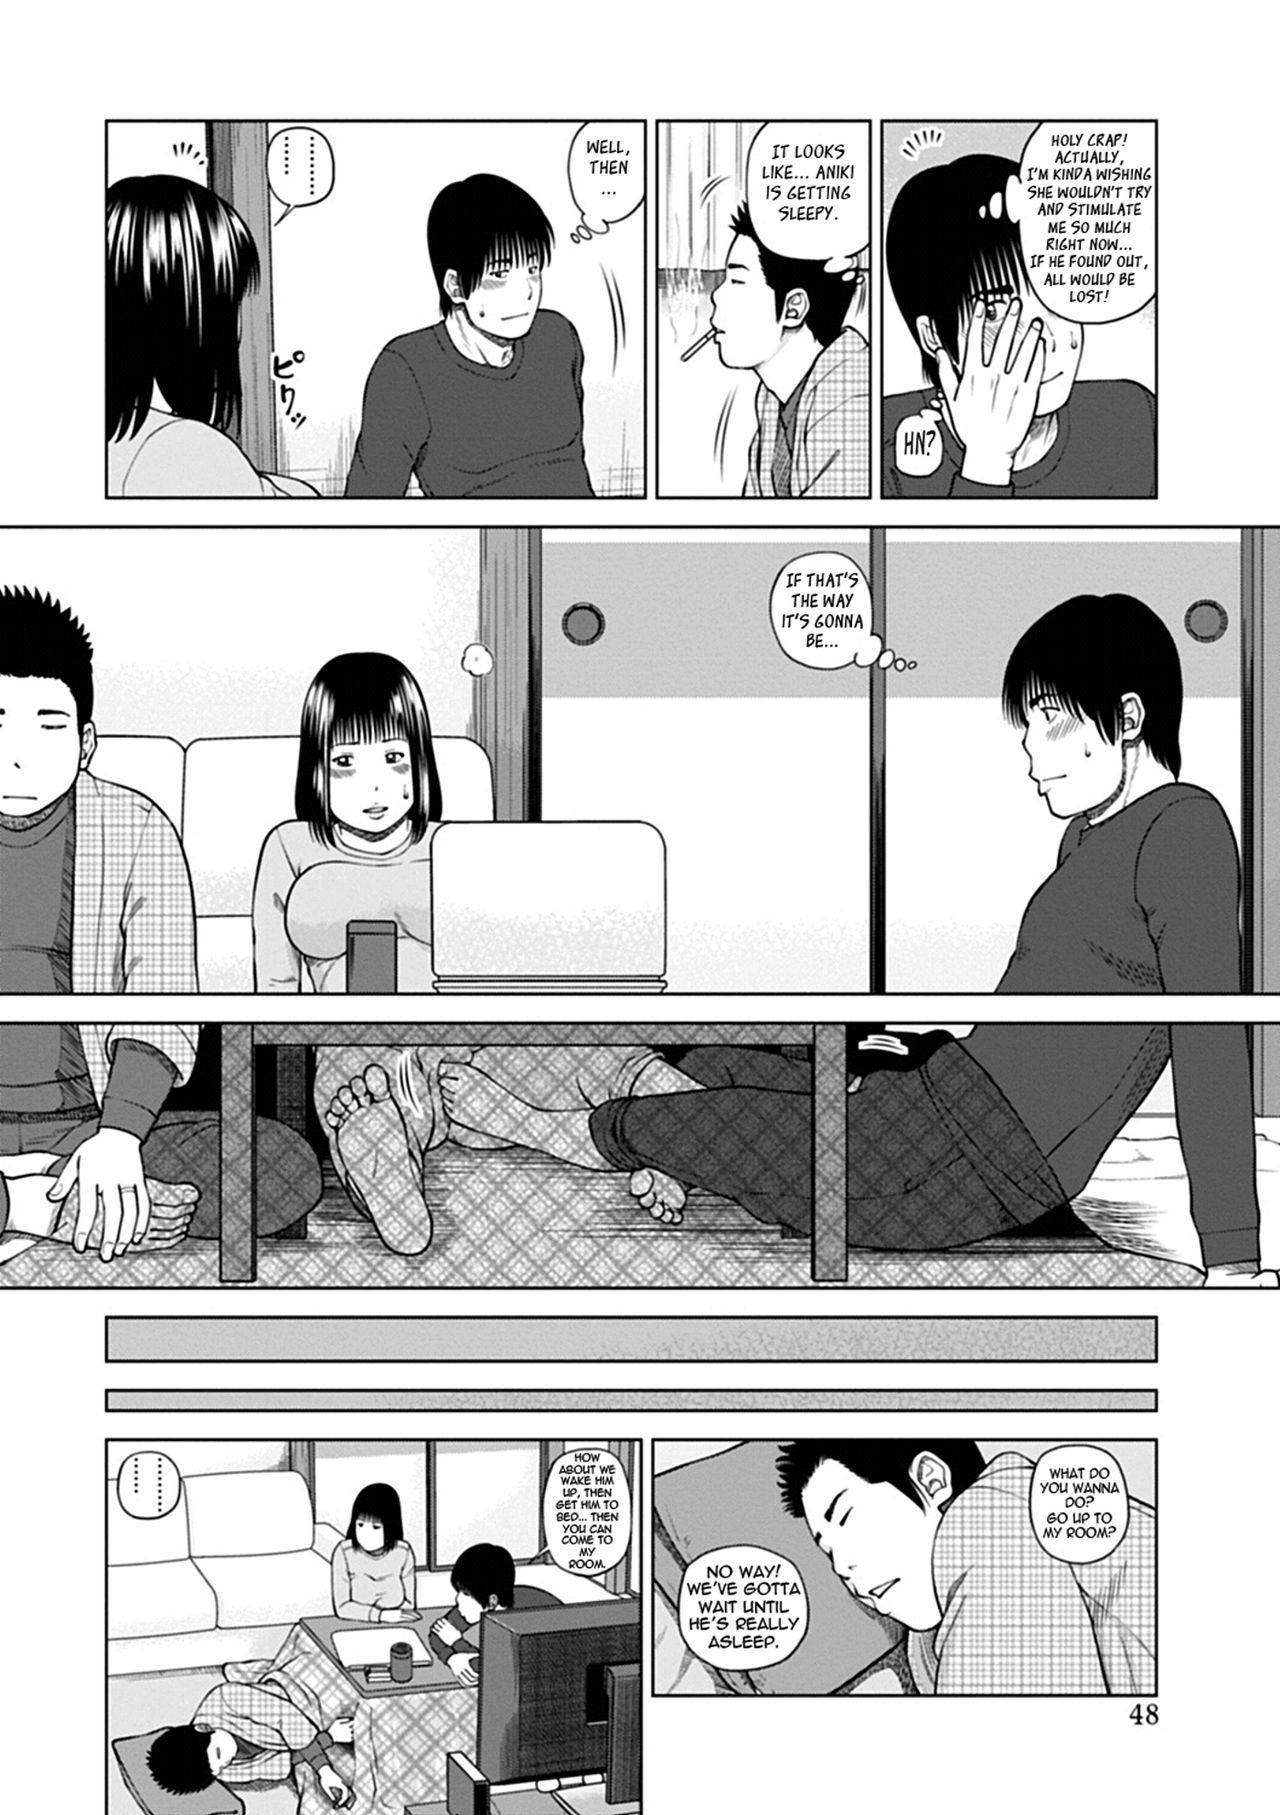 [Kuroki Hidehiko] 36-sai Injuku Sakarizuma | 36-Year-Old Randy Mature Wife [English] {Tadanohito} [Digital] [Uncensored] 45